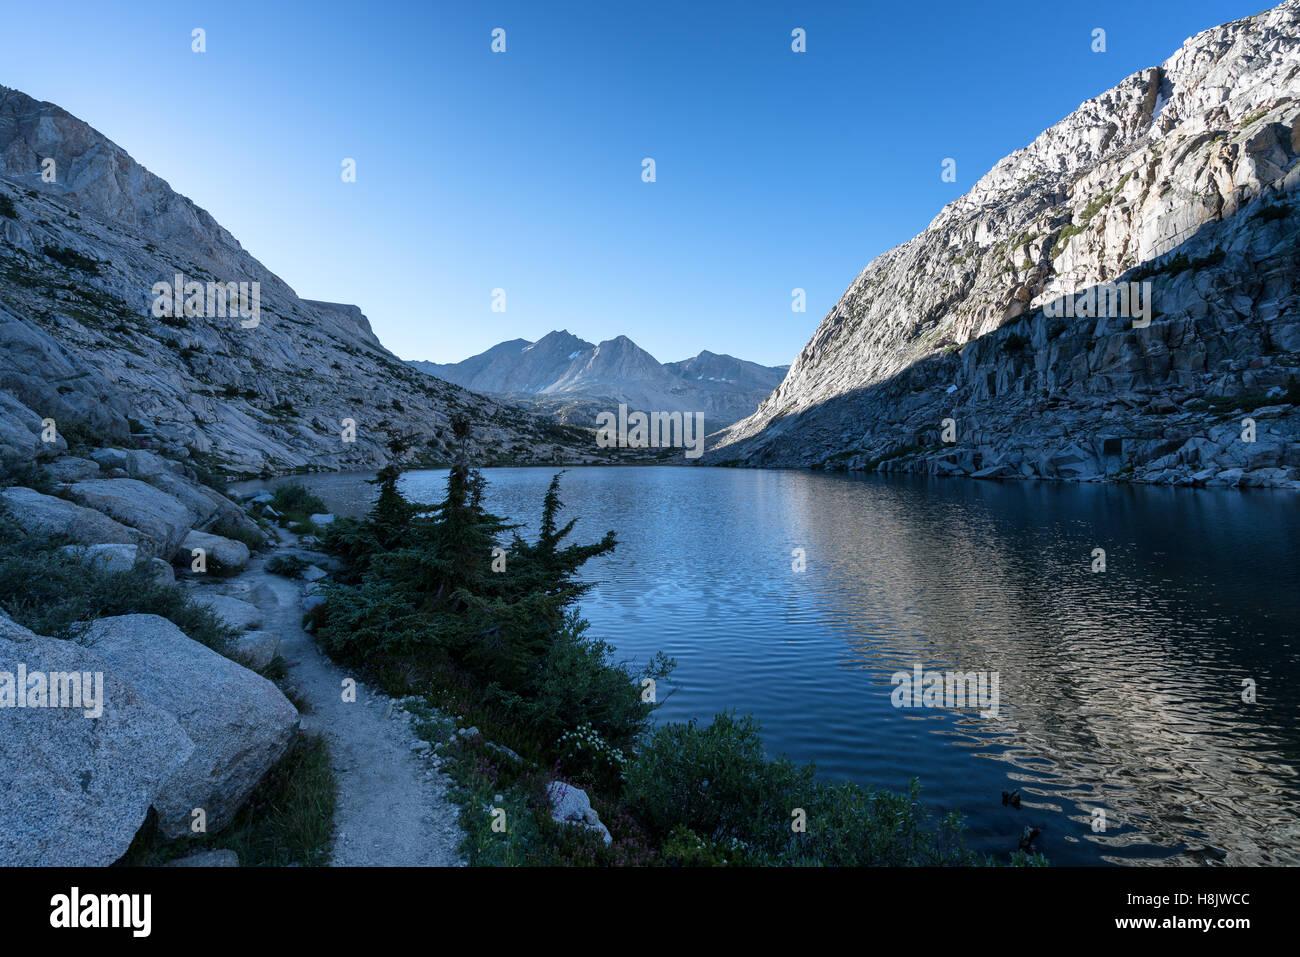 Morning at Evolution Lake, Kings Canyon National Park, Sierra Nevada mountains, California, United States of America - Stock Image